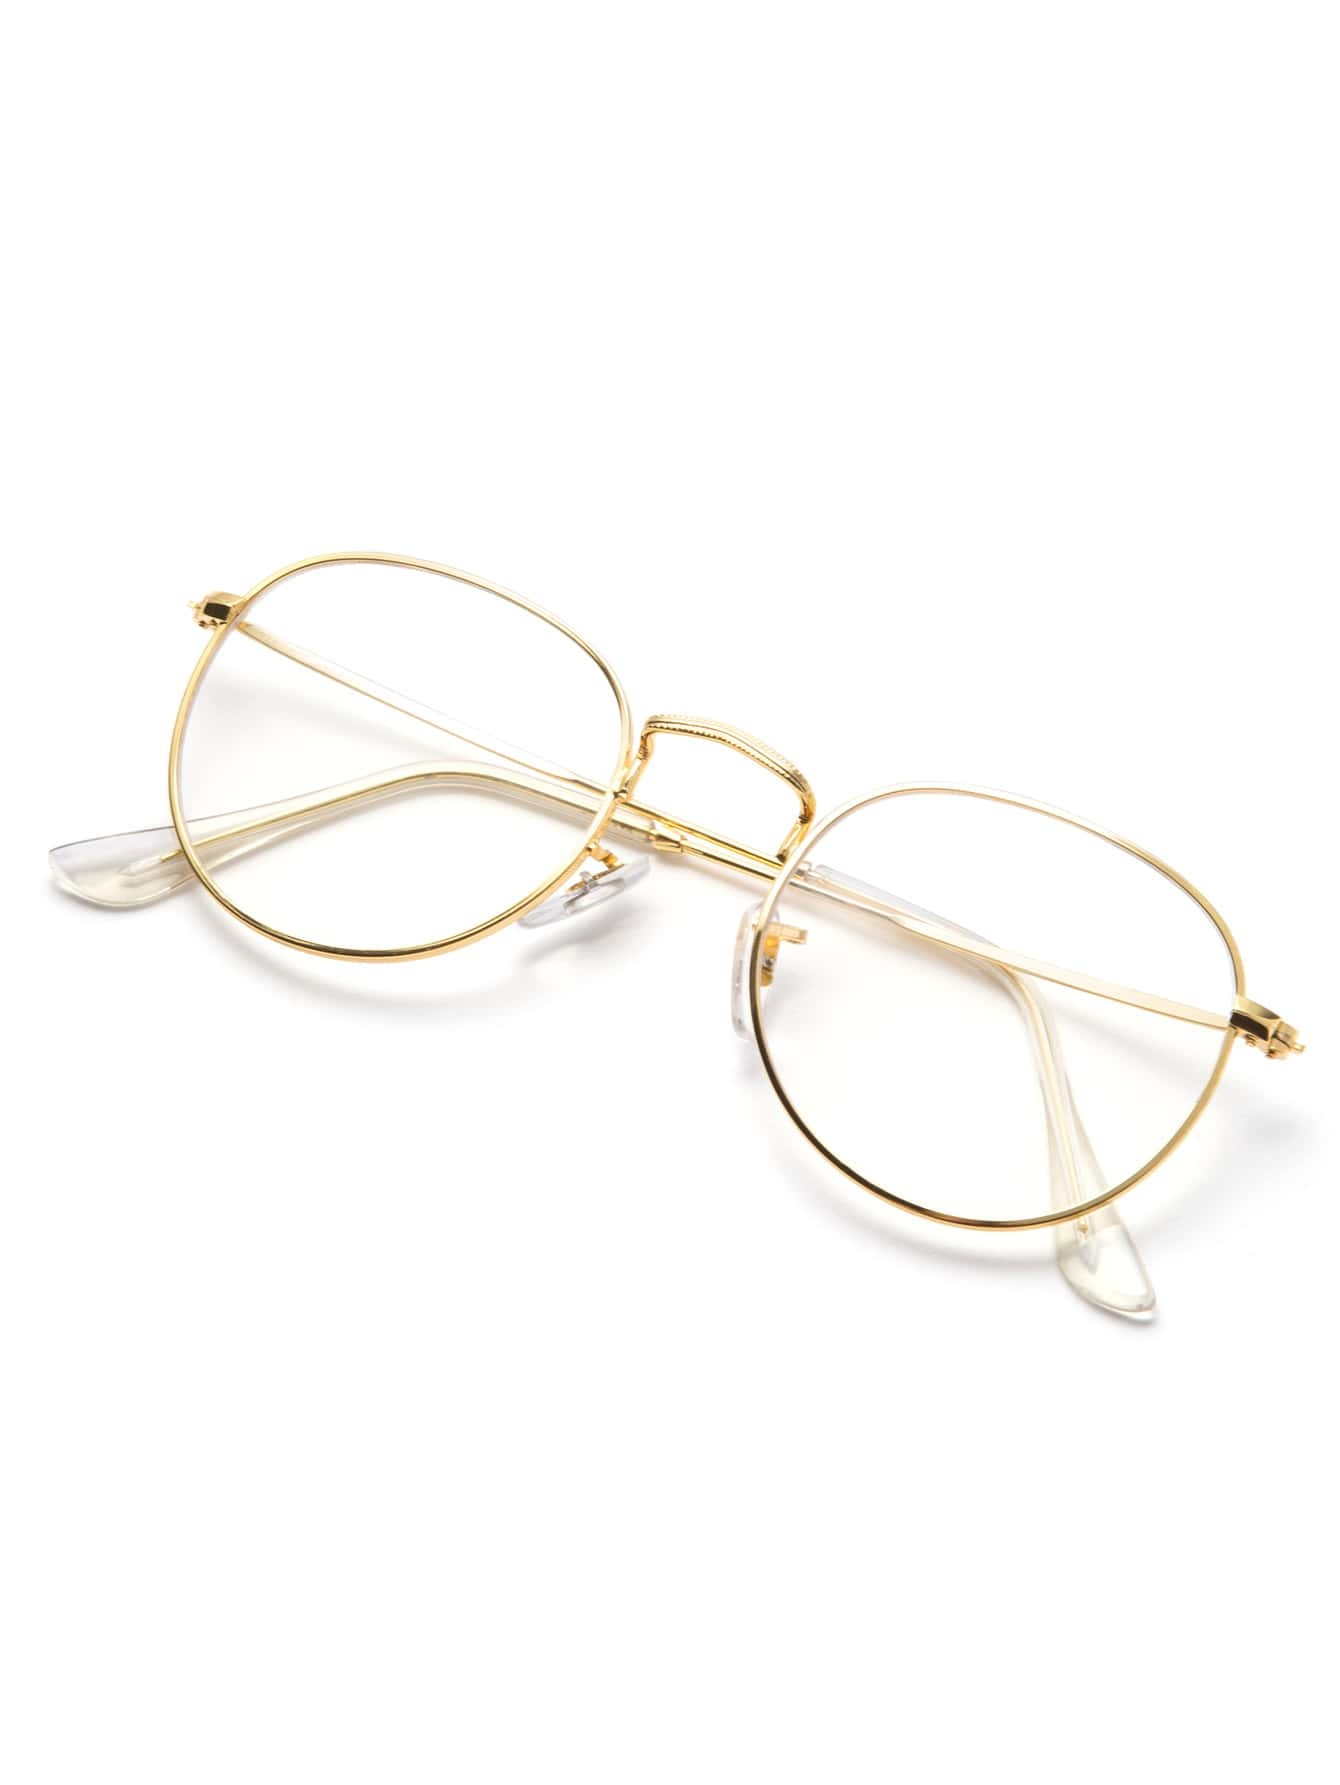 Clear Lens Gold Frame Glasses : Gold Frame Clear Lens Glasses -SheIn(Sheinside)